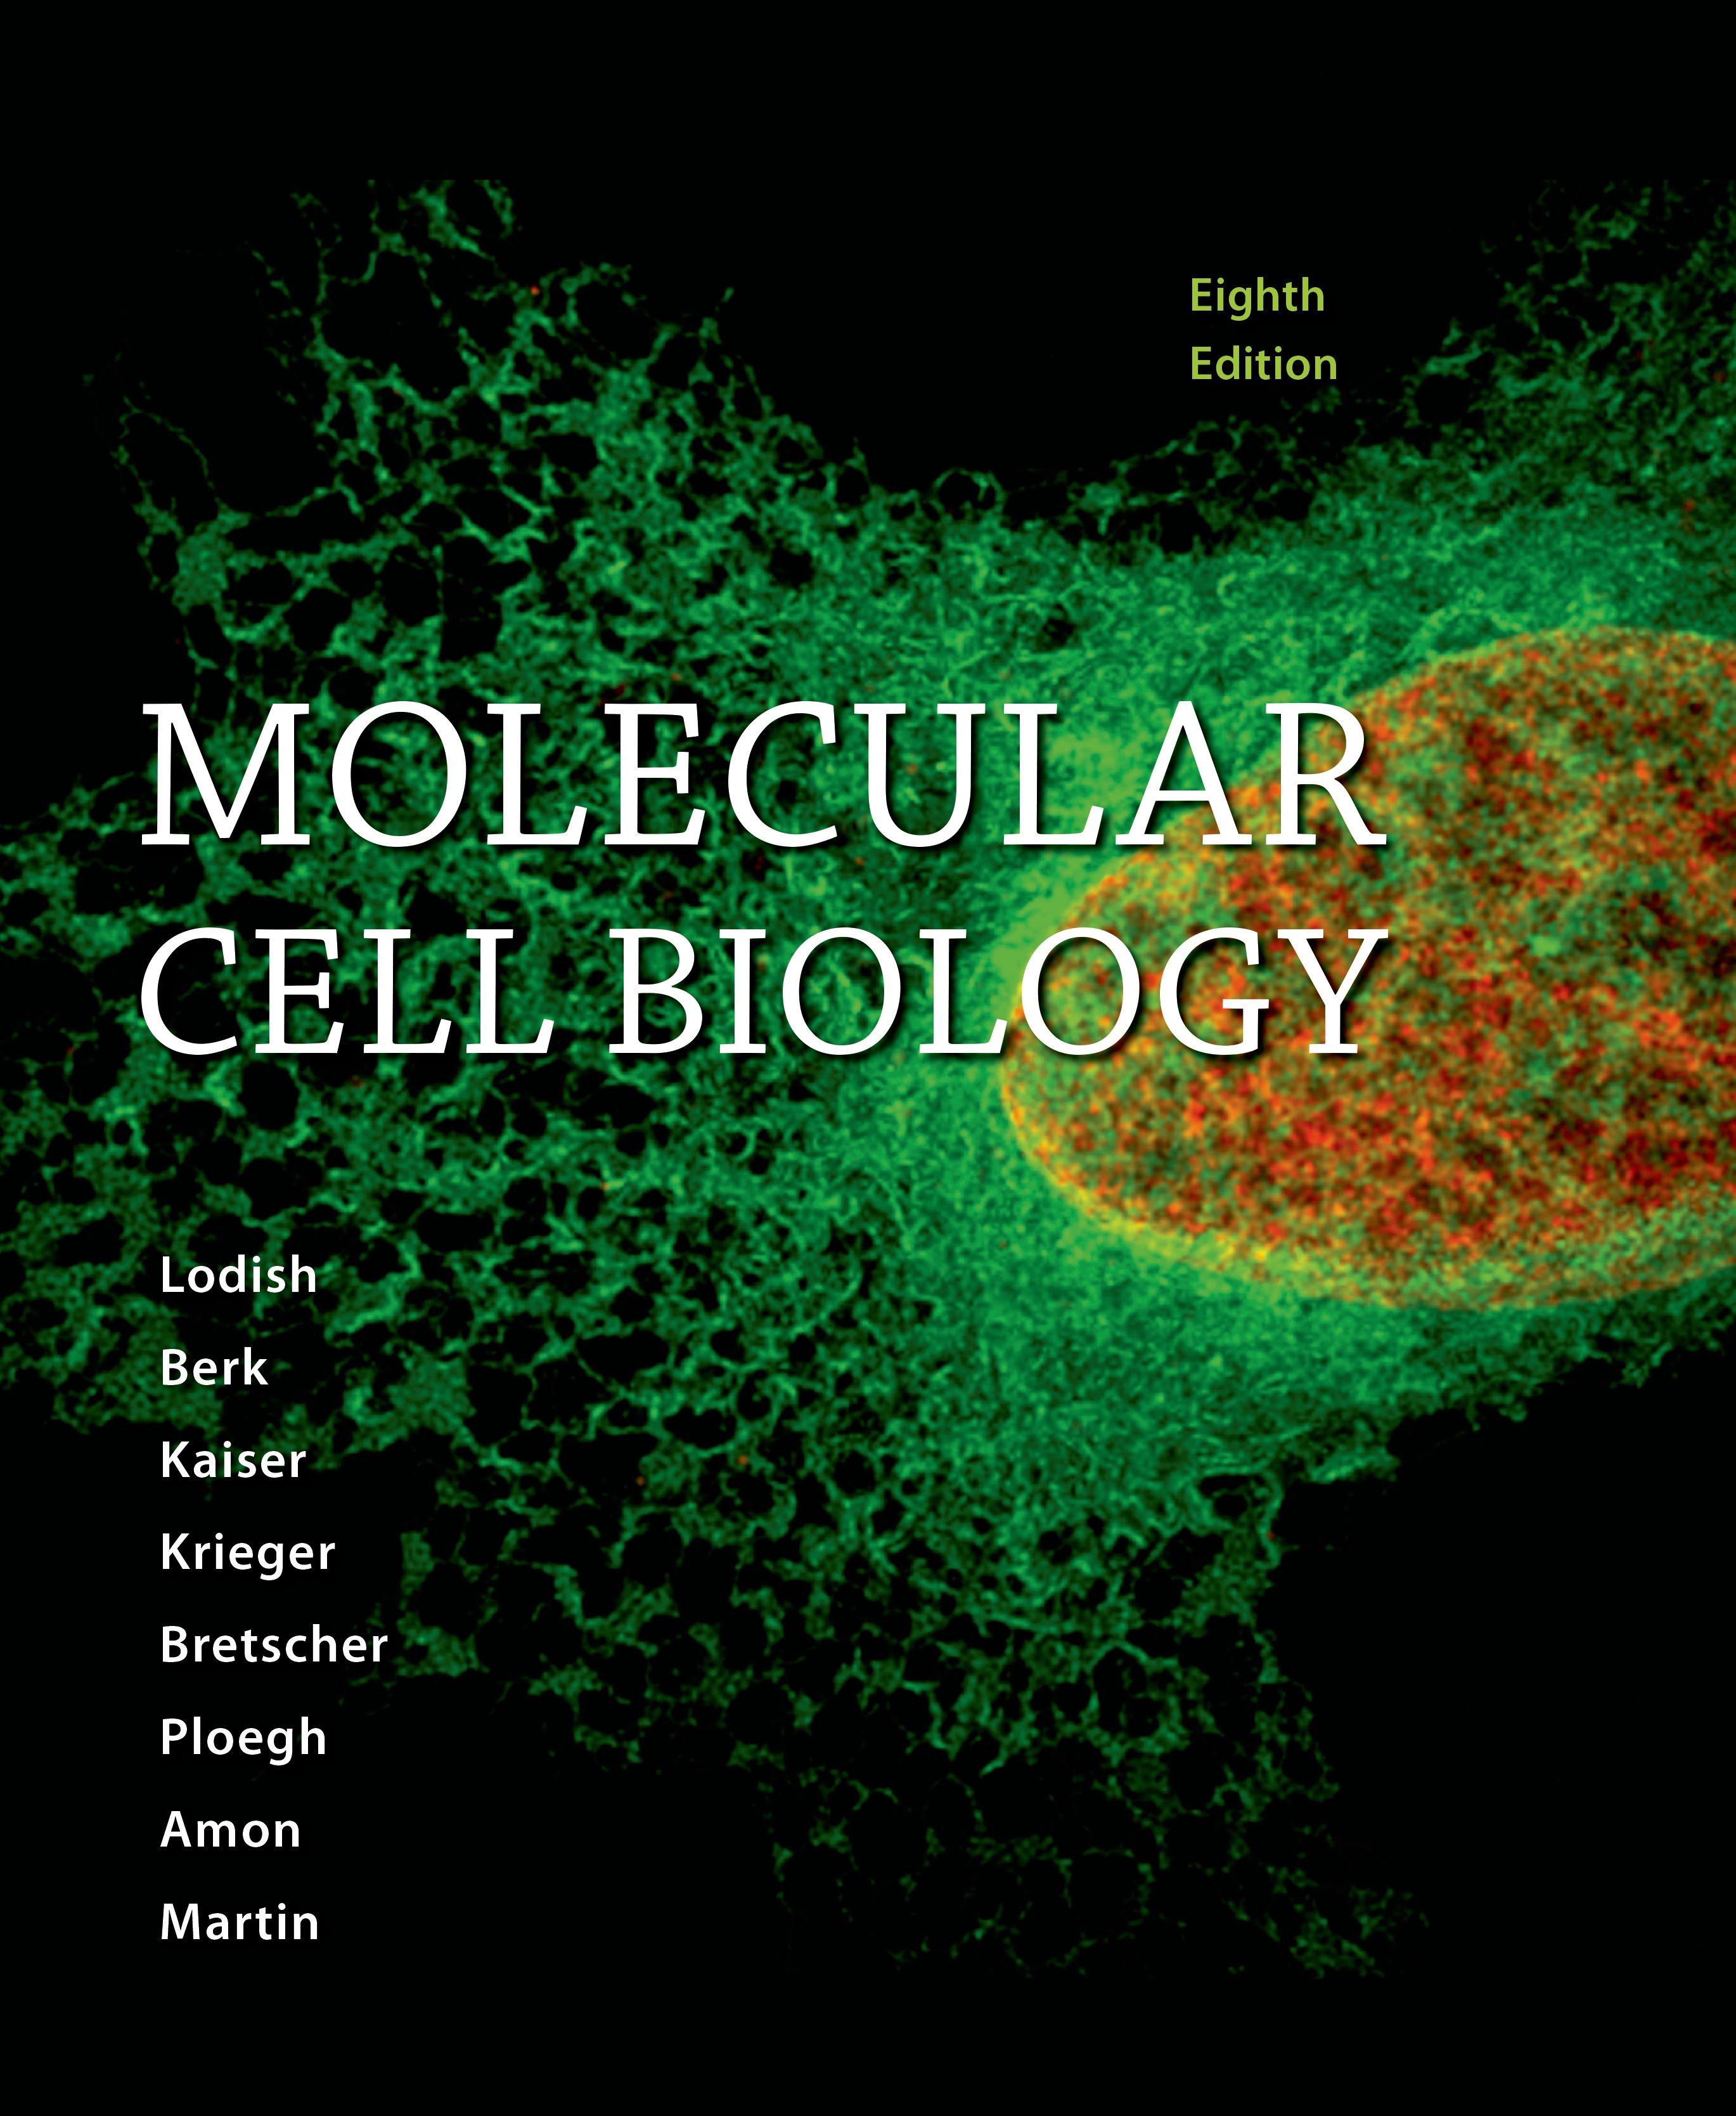 کتاب لودیش زیست شناسی سلولی و مولکولی 2016   Lodish Molecular cell biology